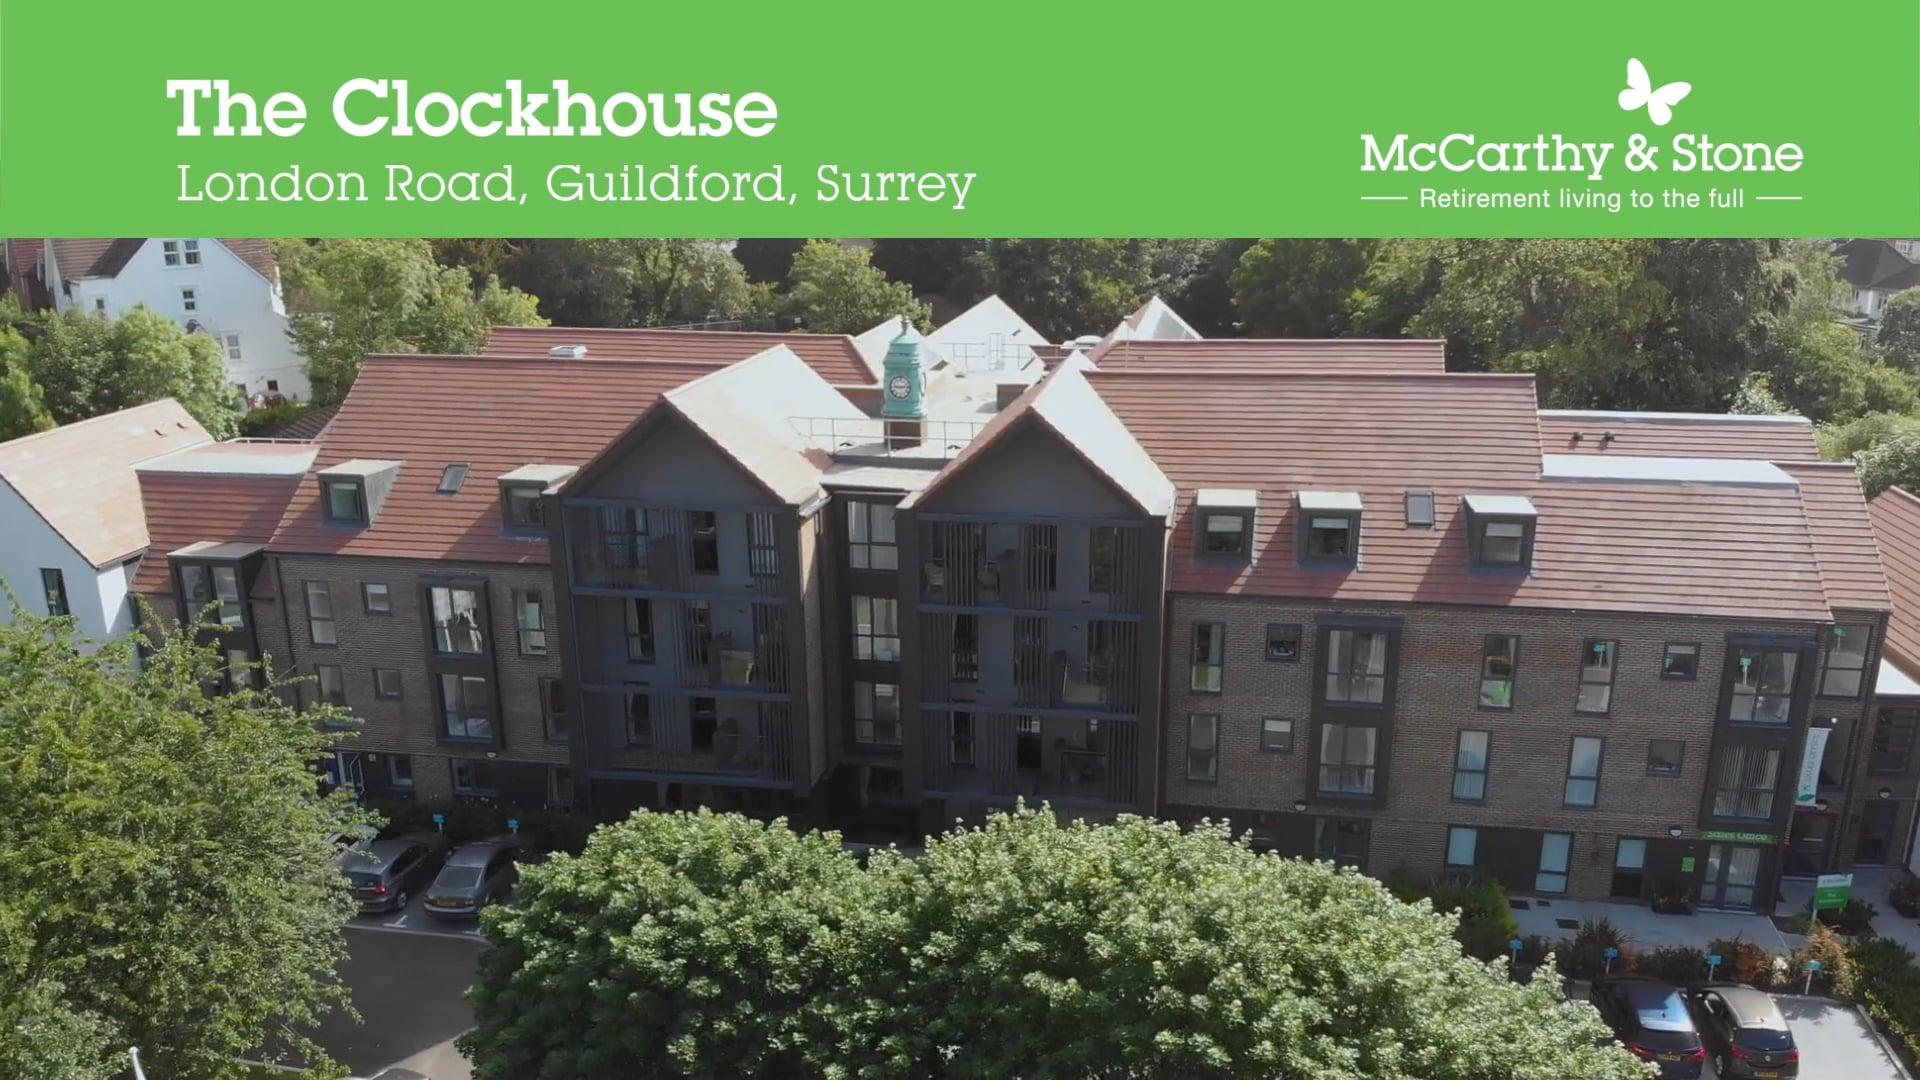 MCARTHY & STONE, THE CLOCKHOUSE